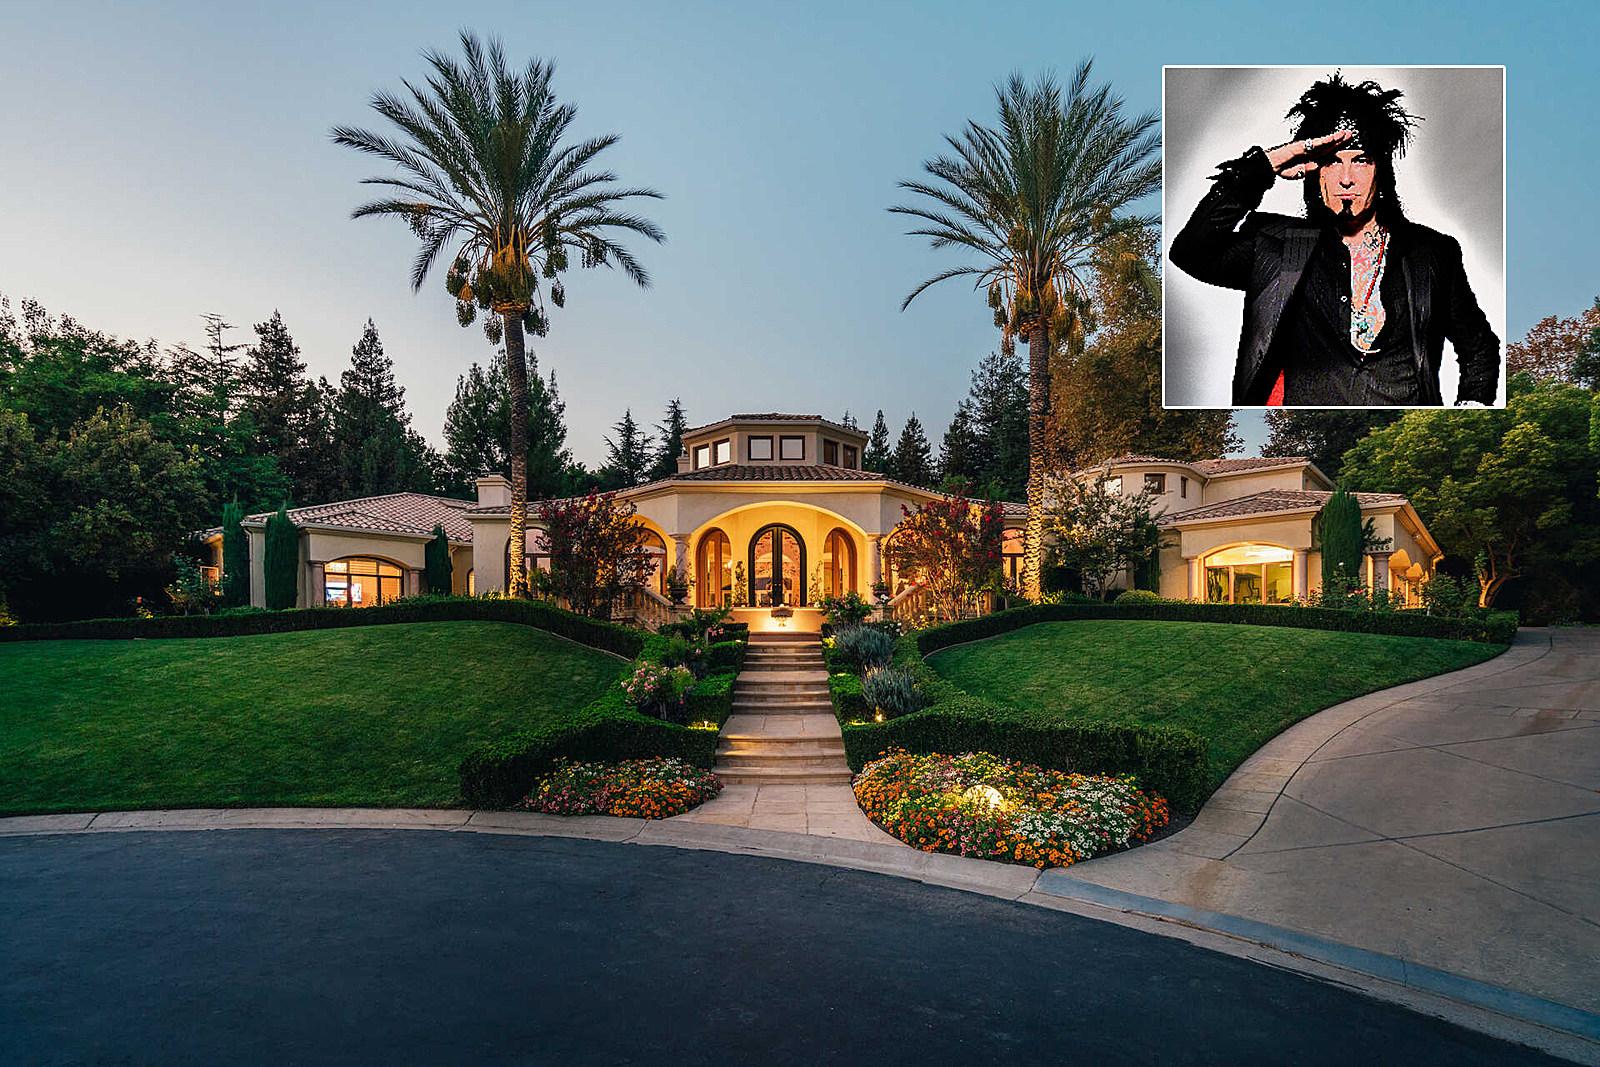 Motley Crue's Nikki Sixx Sells 'Breathtaking' Home for $5.18M